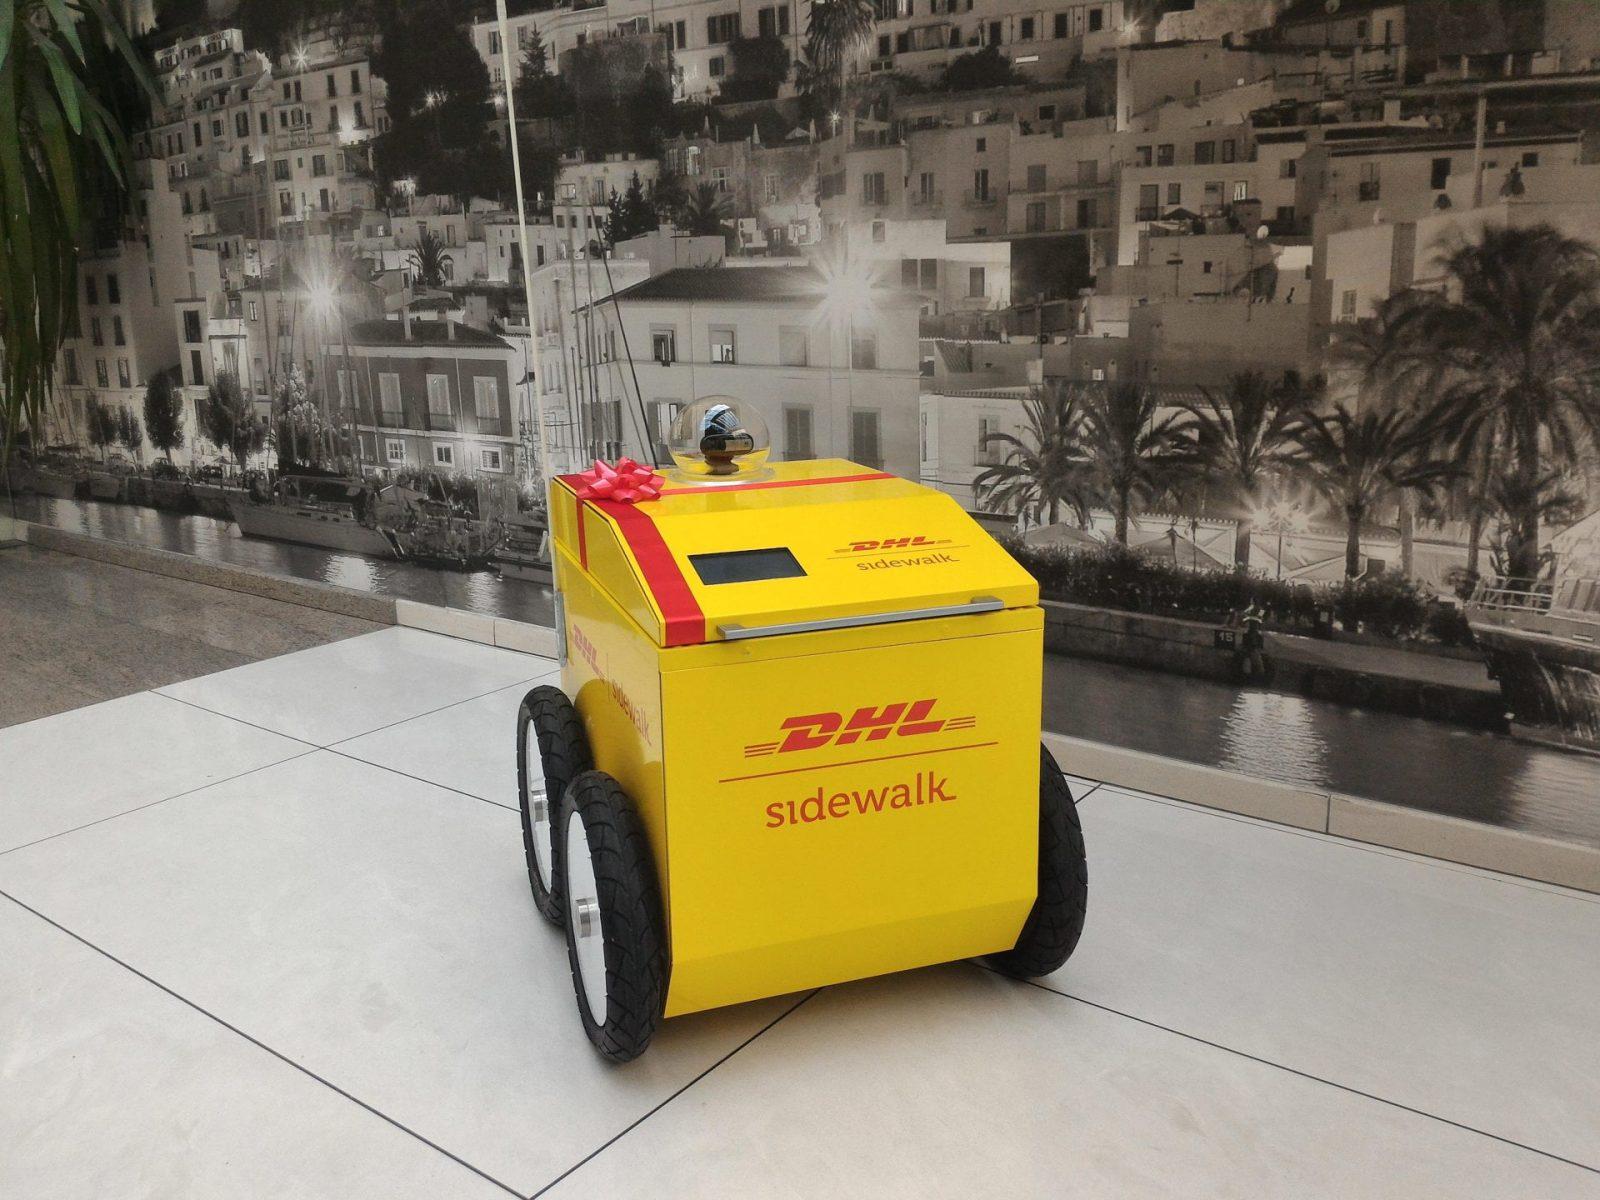 DHL design Robotics for improving logistics Challenge 2016